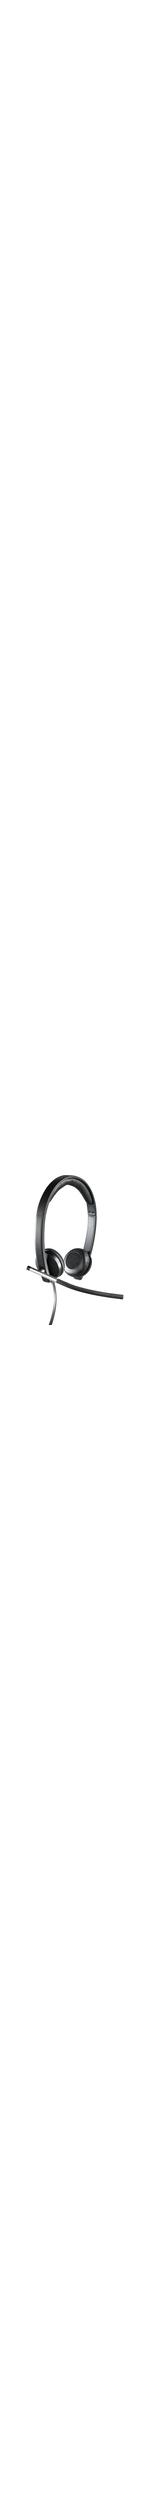 Logitech H650e Wired Headset - Over-the-head - Supra-aural - 50 Hz - 10 kHz - USB